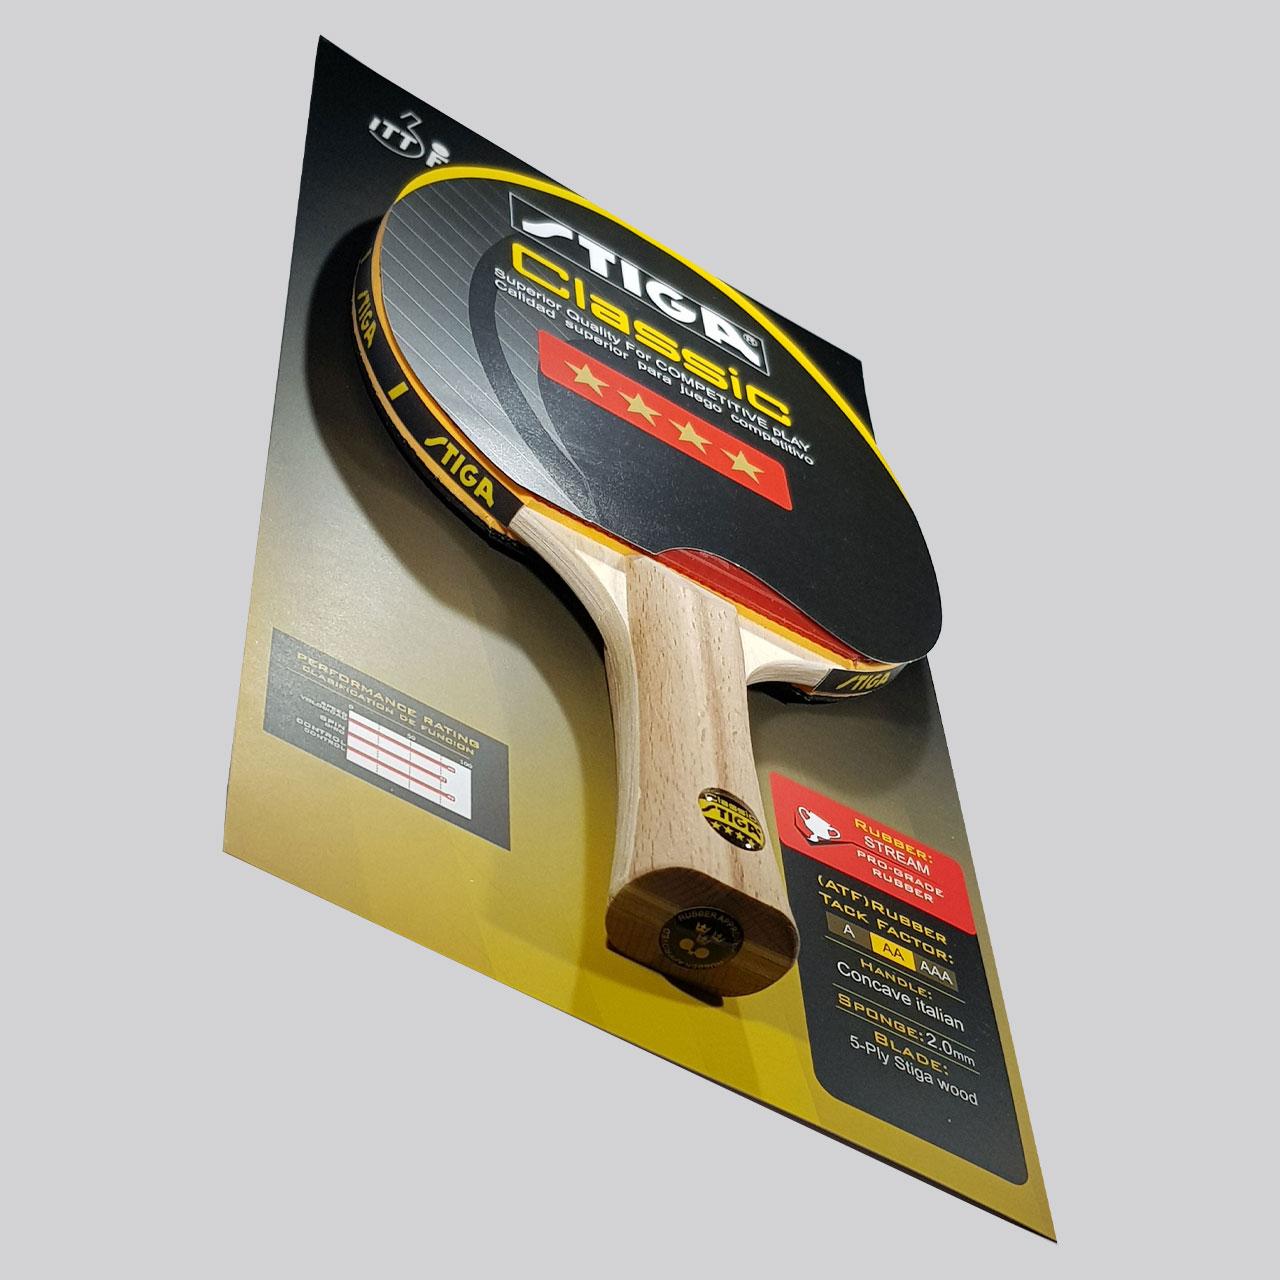 راکت پینگ پنگ مدل  ایتوک main 1 9